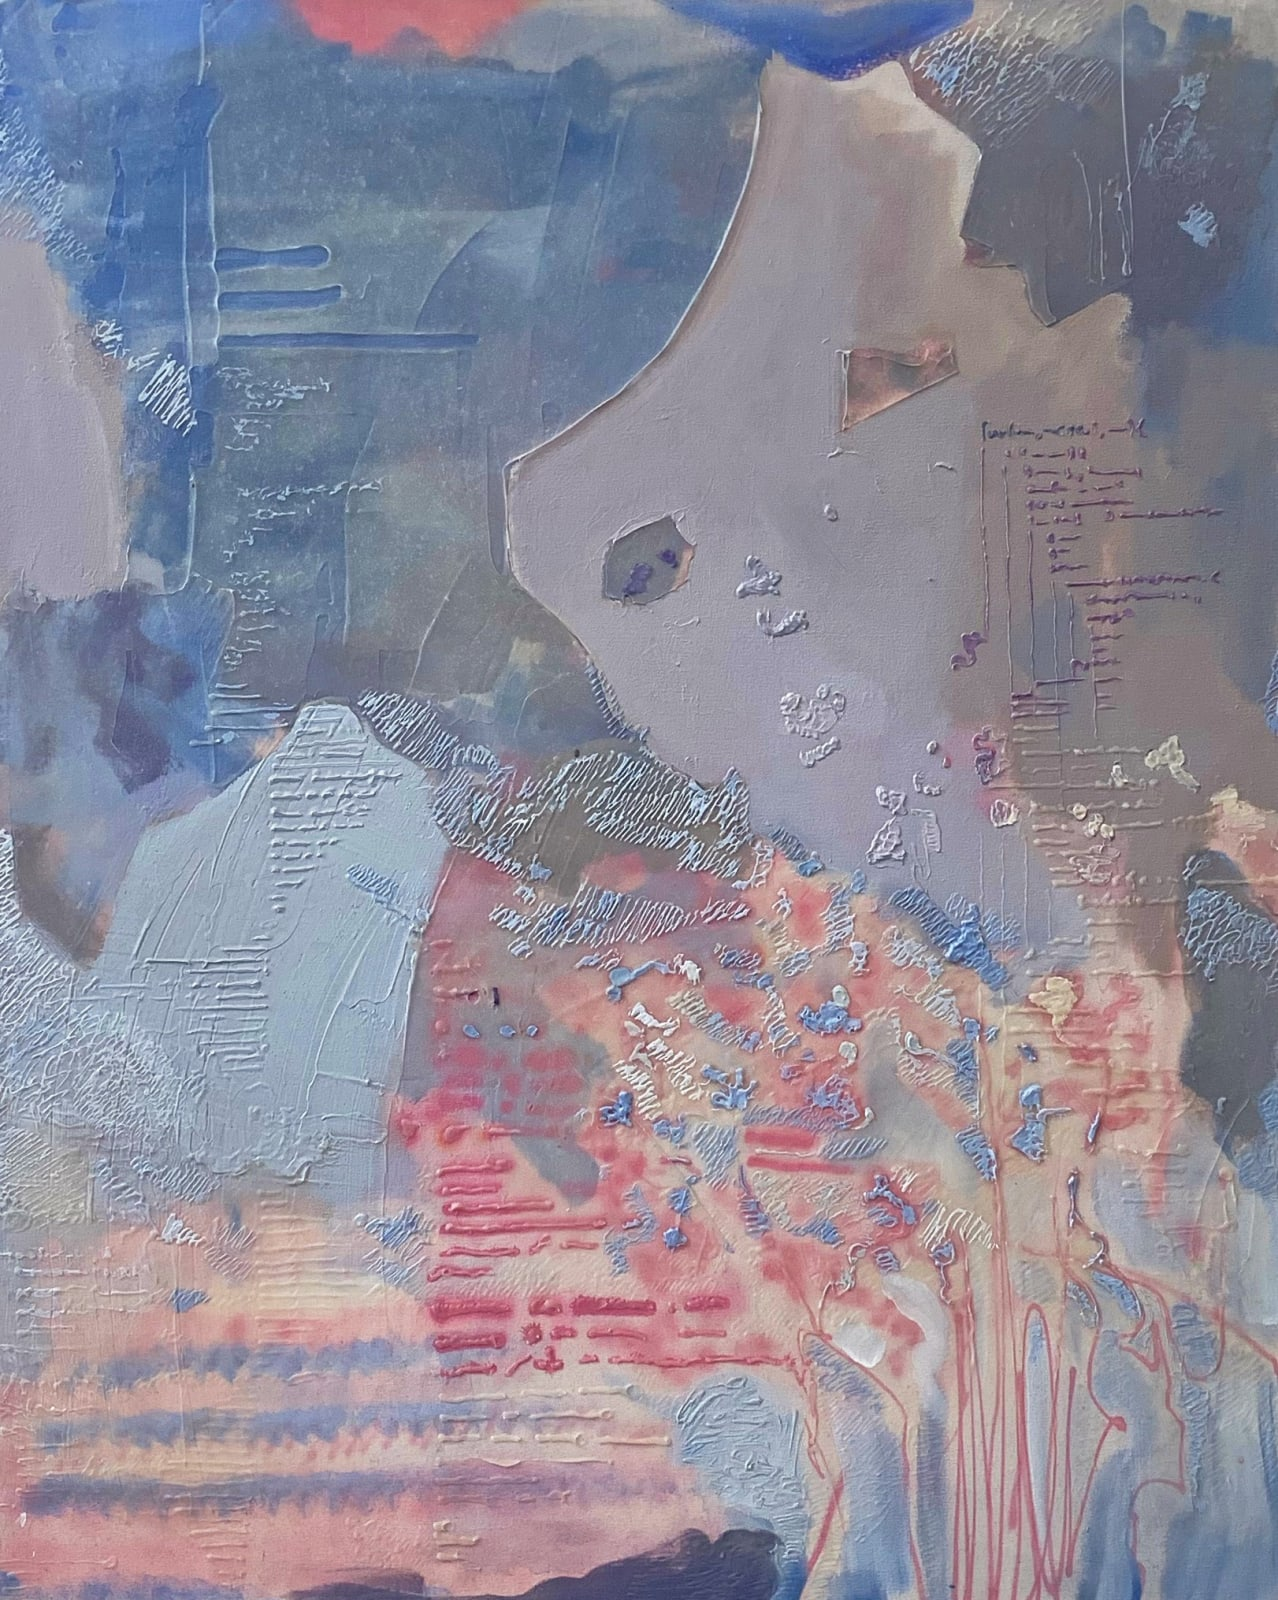 Ricardo Cabret Un Nuevo Lenguaje, 2020 Gel polymers and acrylic on canvas 50 x 40 in 127 x 101.6 cm